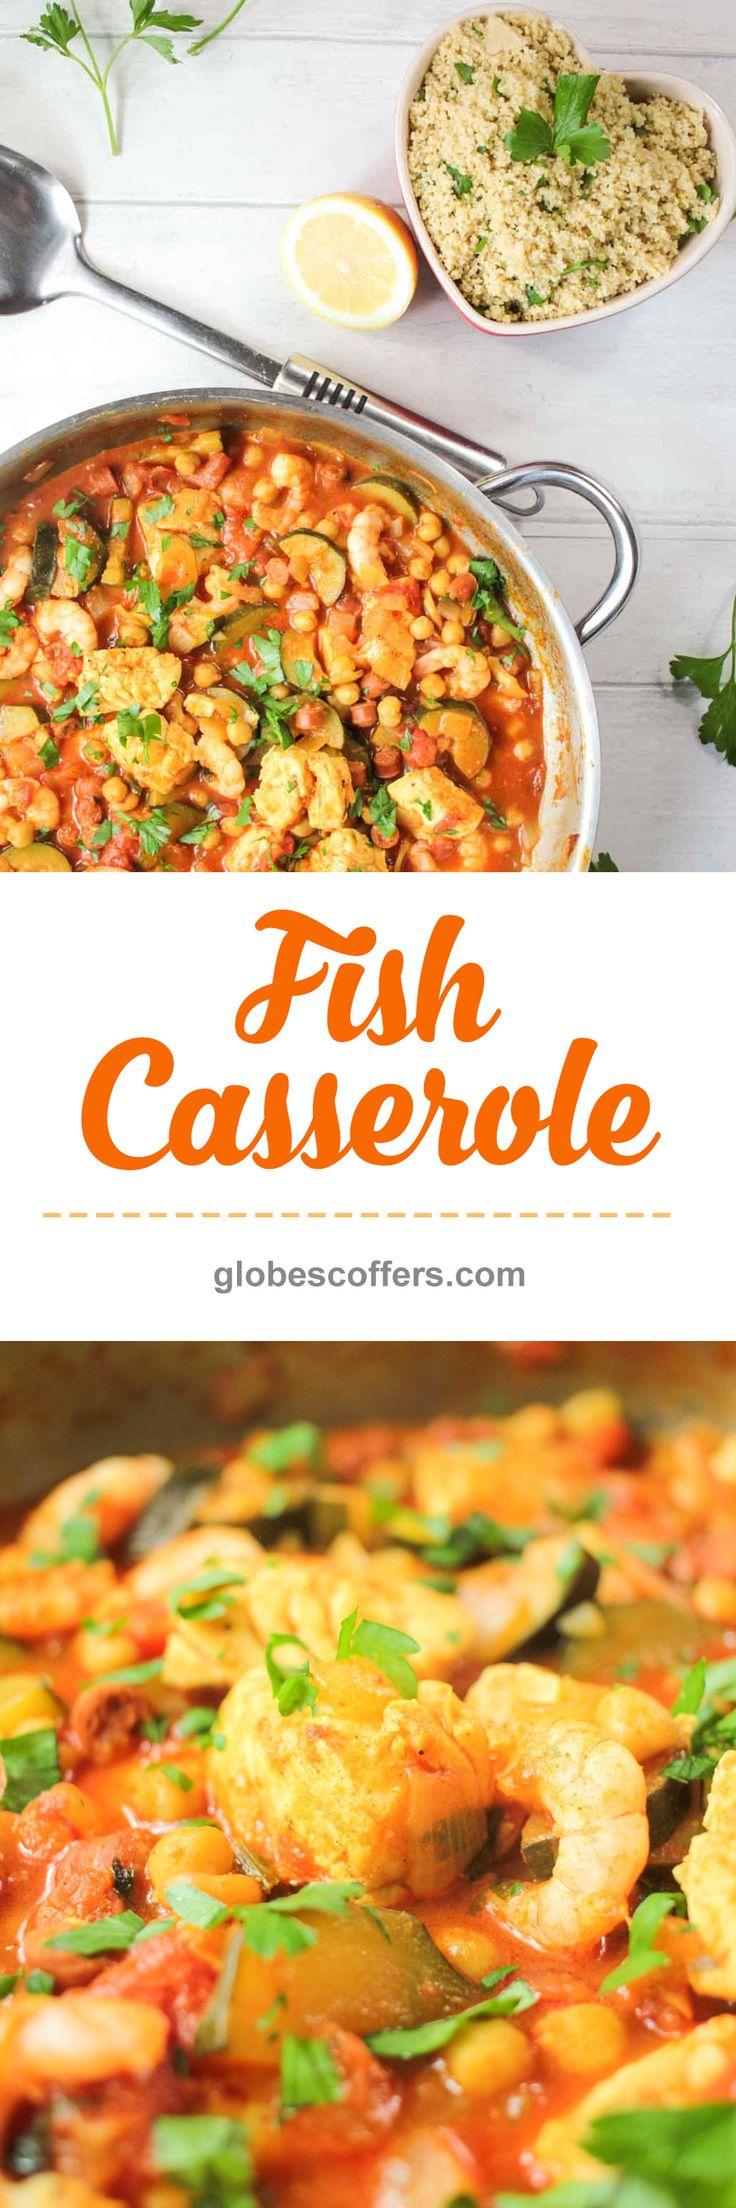 Fish Casserole Recipe - Globe Scoffers | globescoffers.com